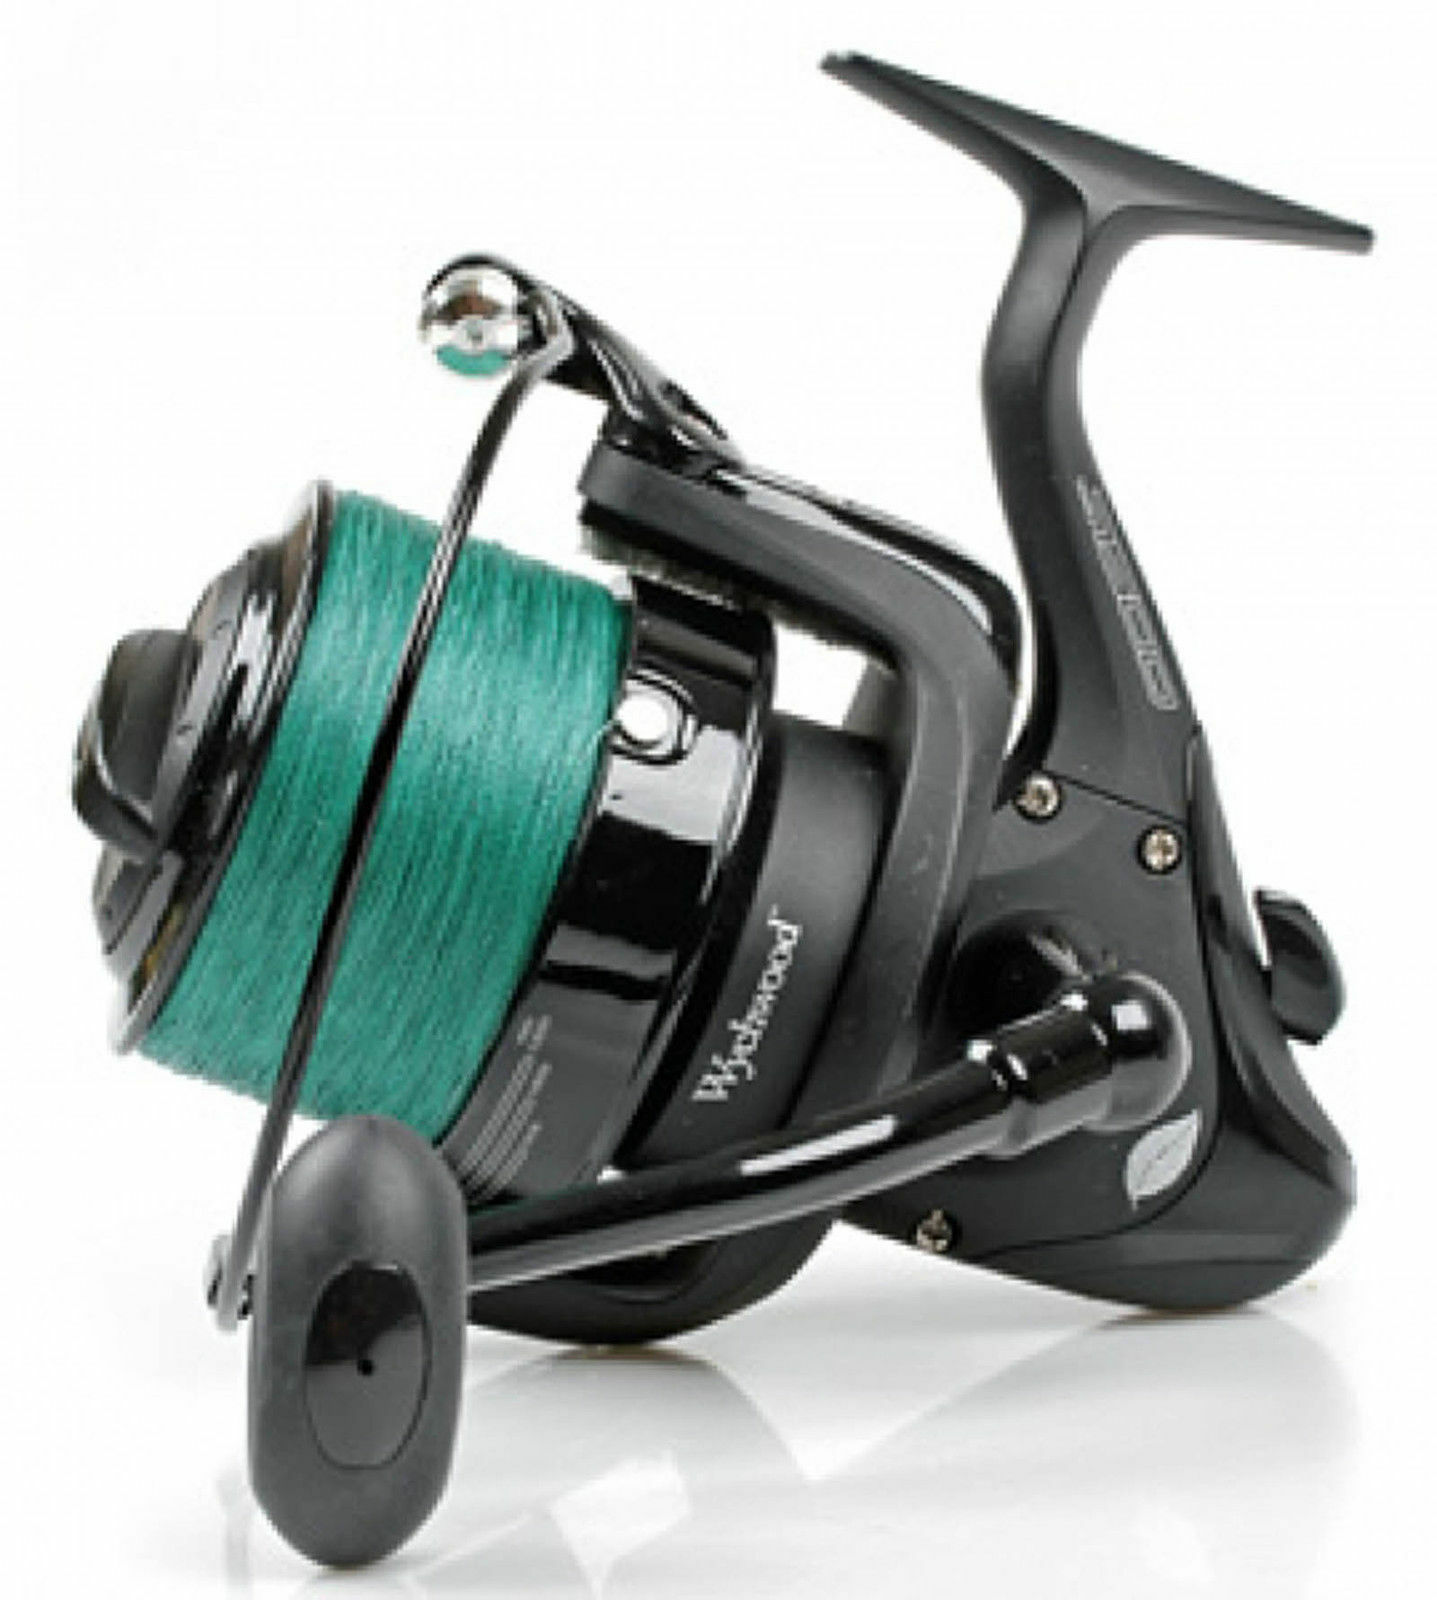 Wychbois dispatch fishing reel 7500 spod voiturepe 200m loaded 30lb tresse